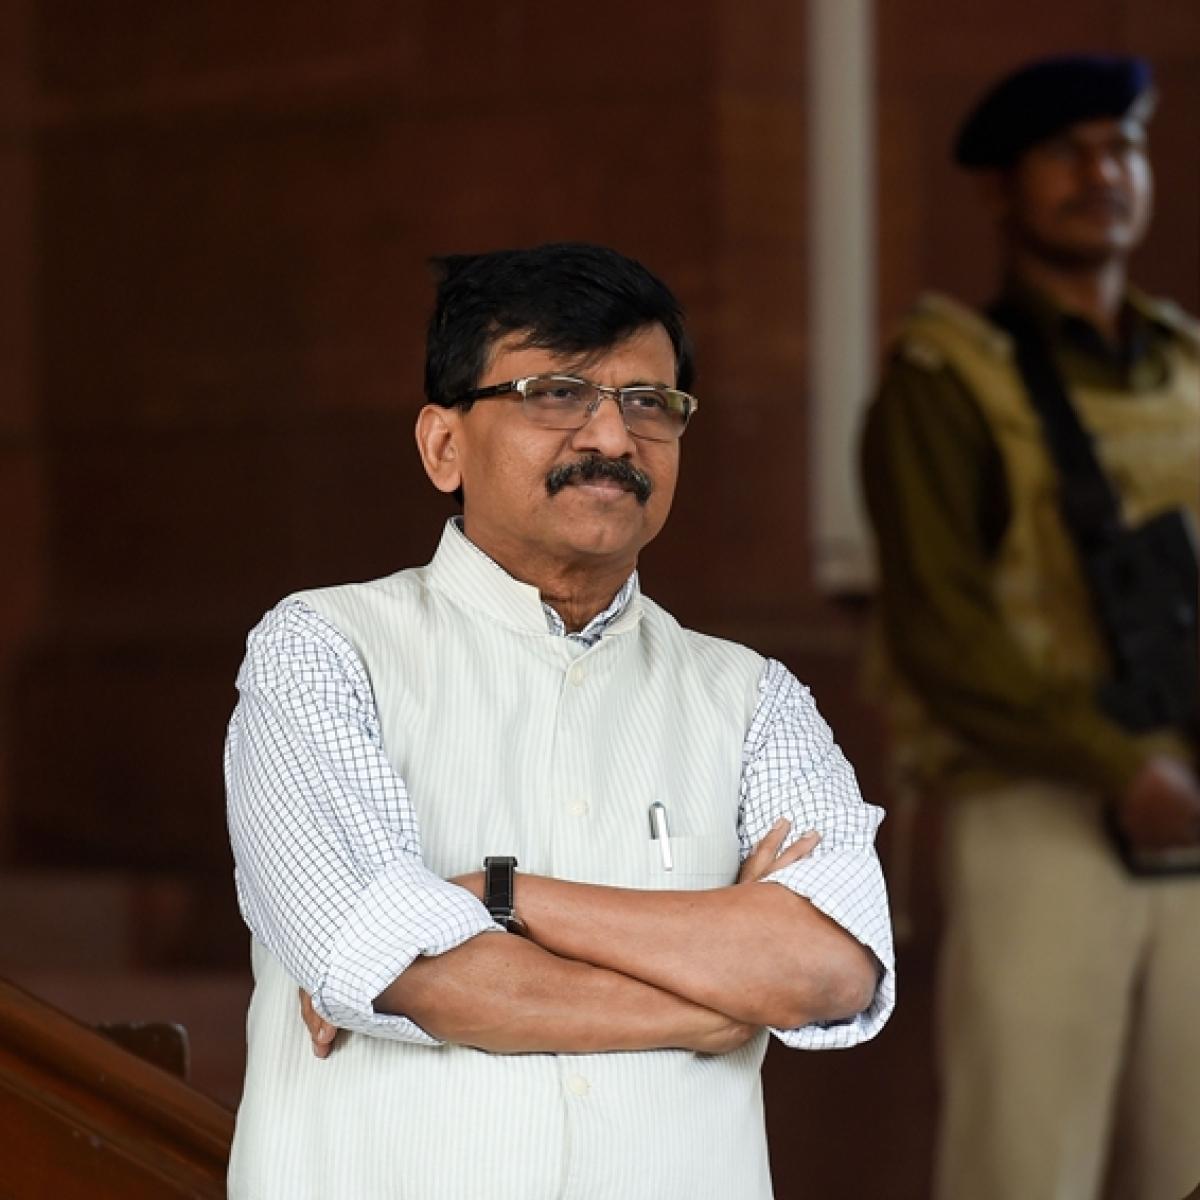 'We've dictionaries': Sanjay Raut's 'Haramkhor-naughty' iteration in Bombay HC